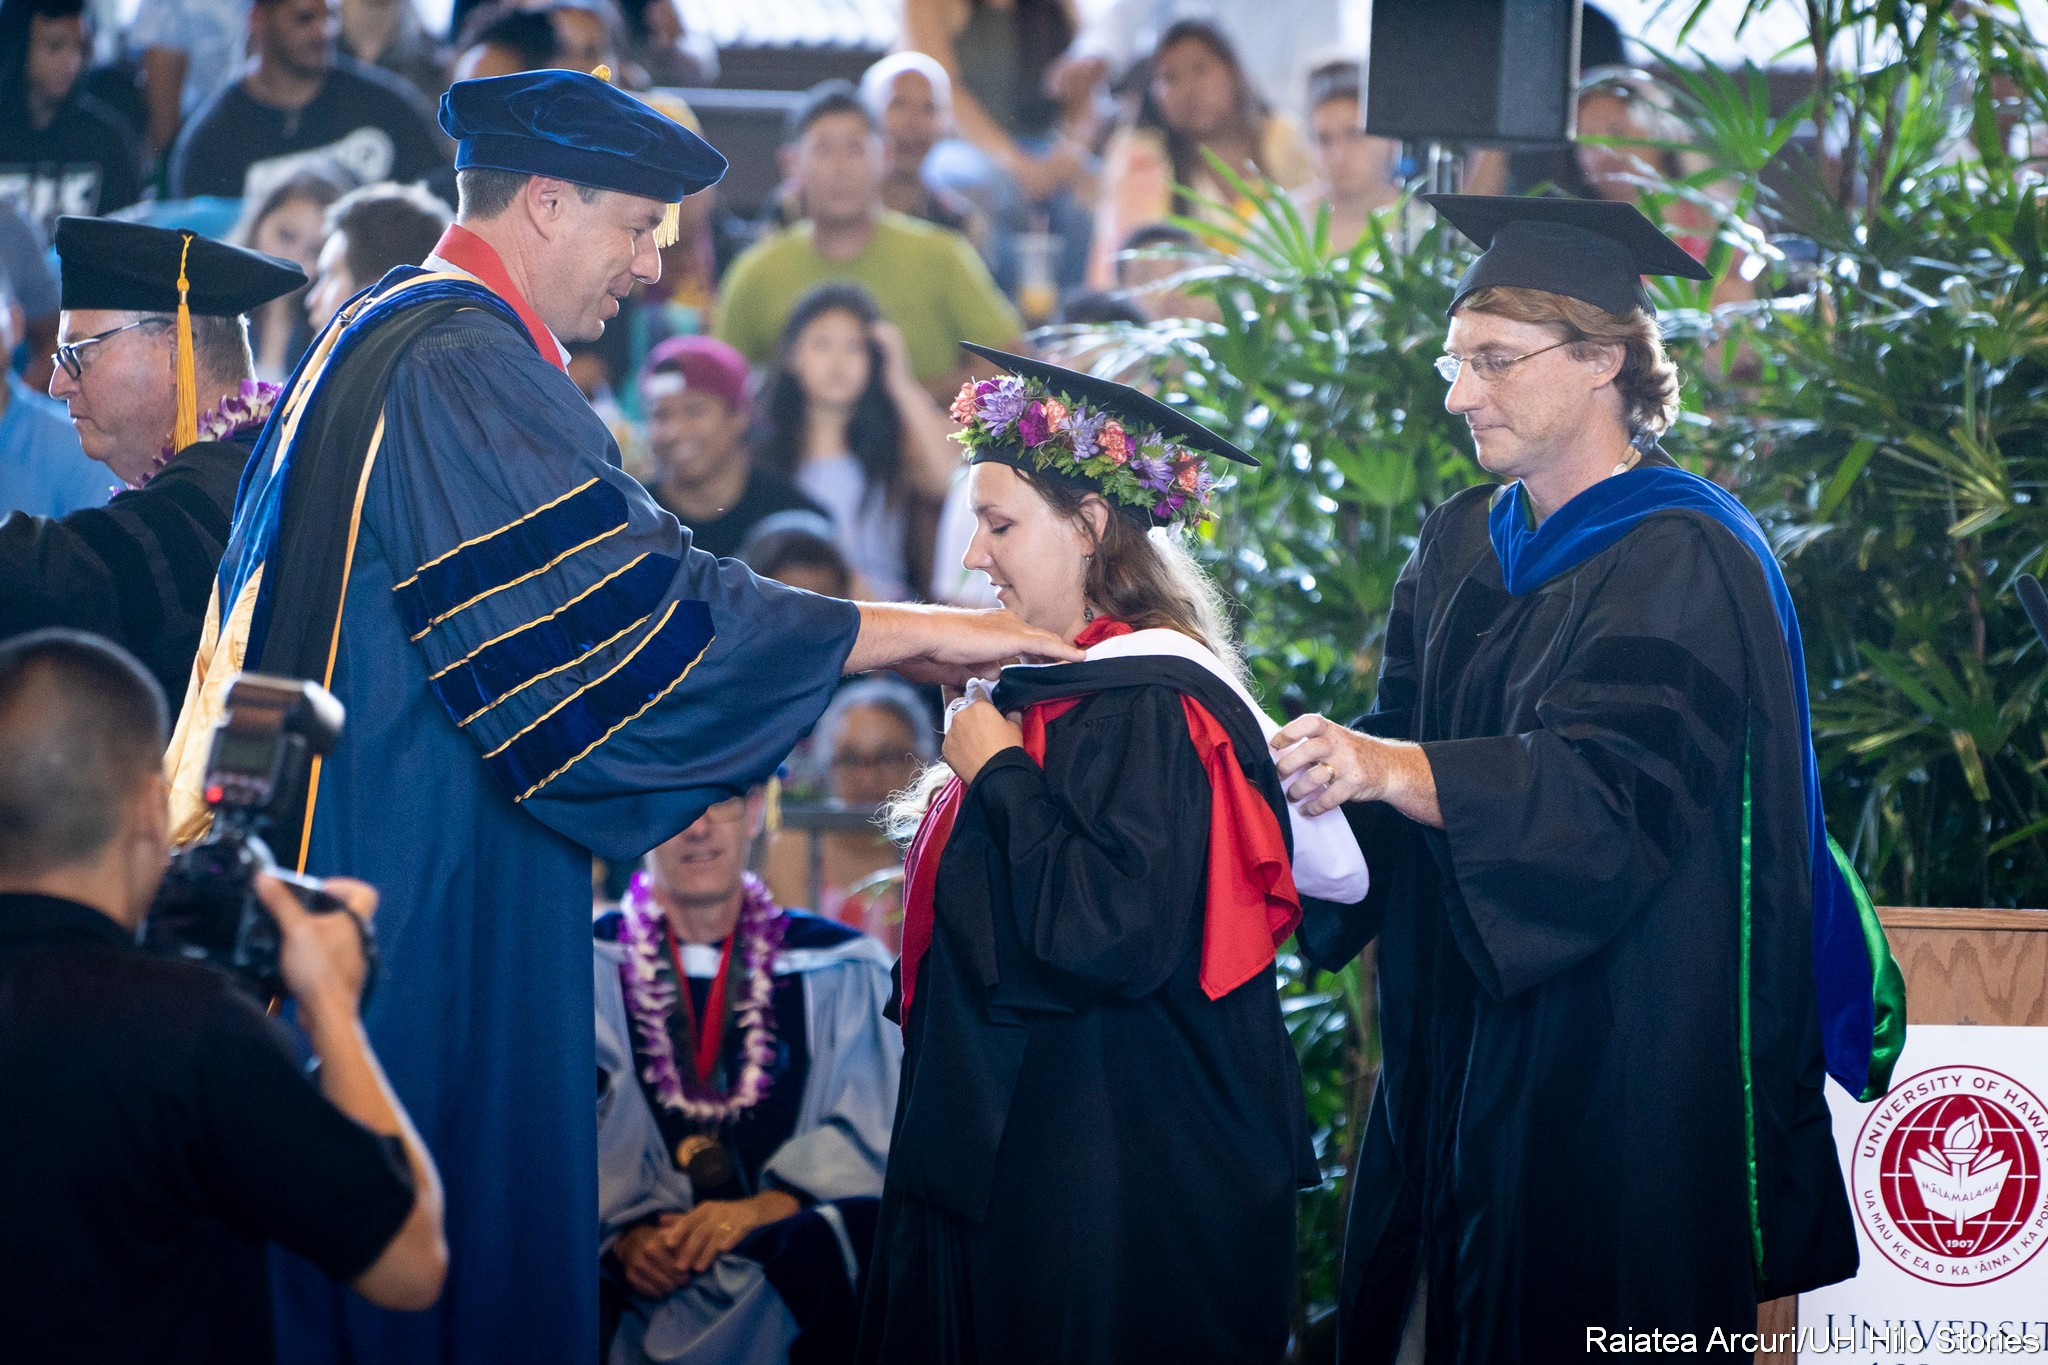 Graduate received hood.